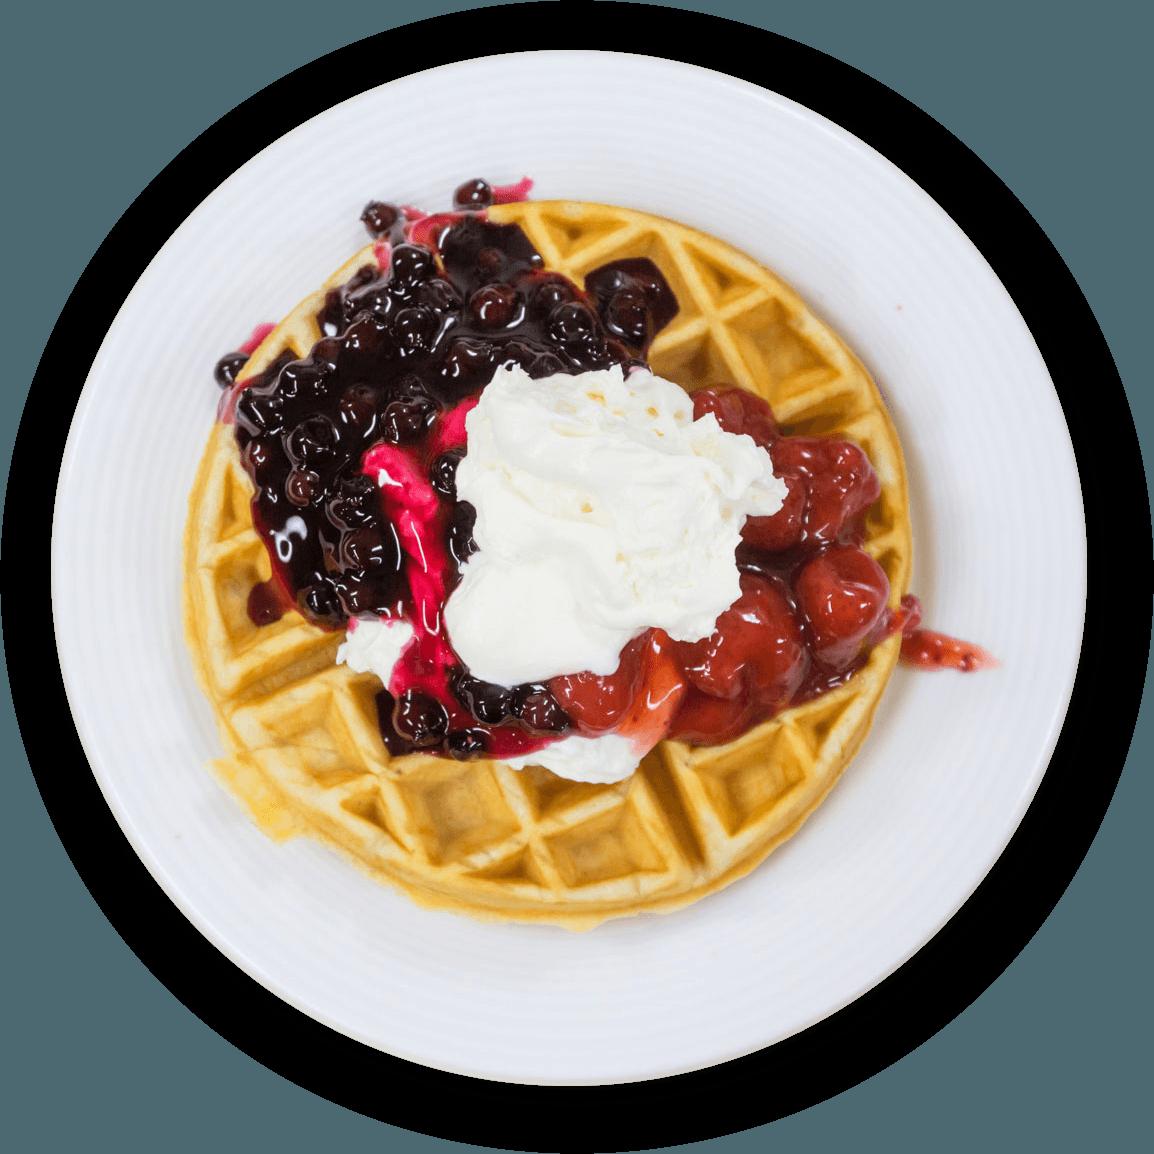 Dessert waffle photo